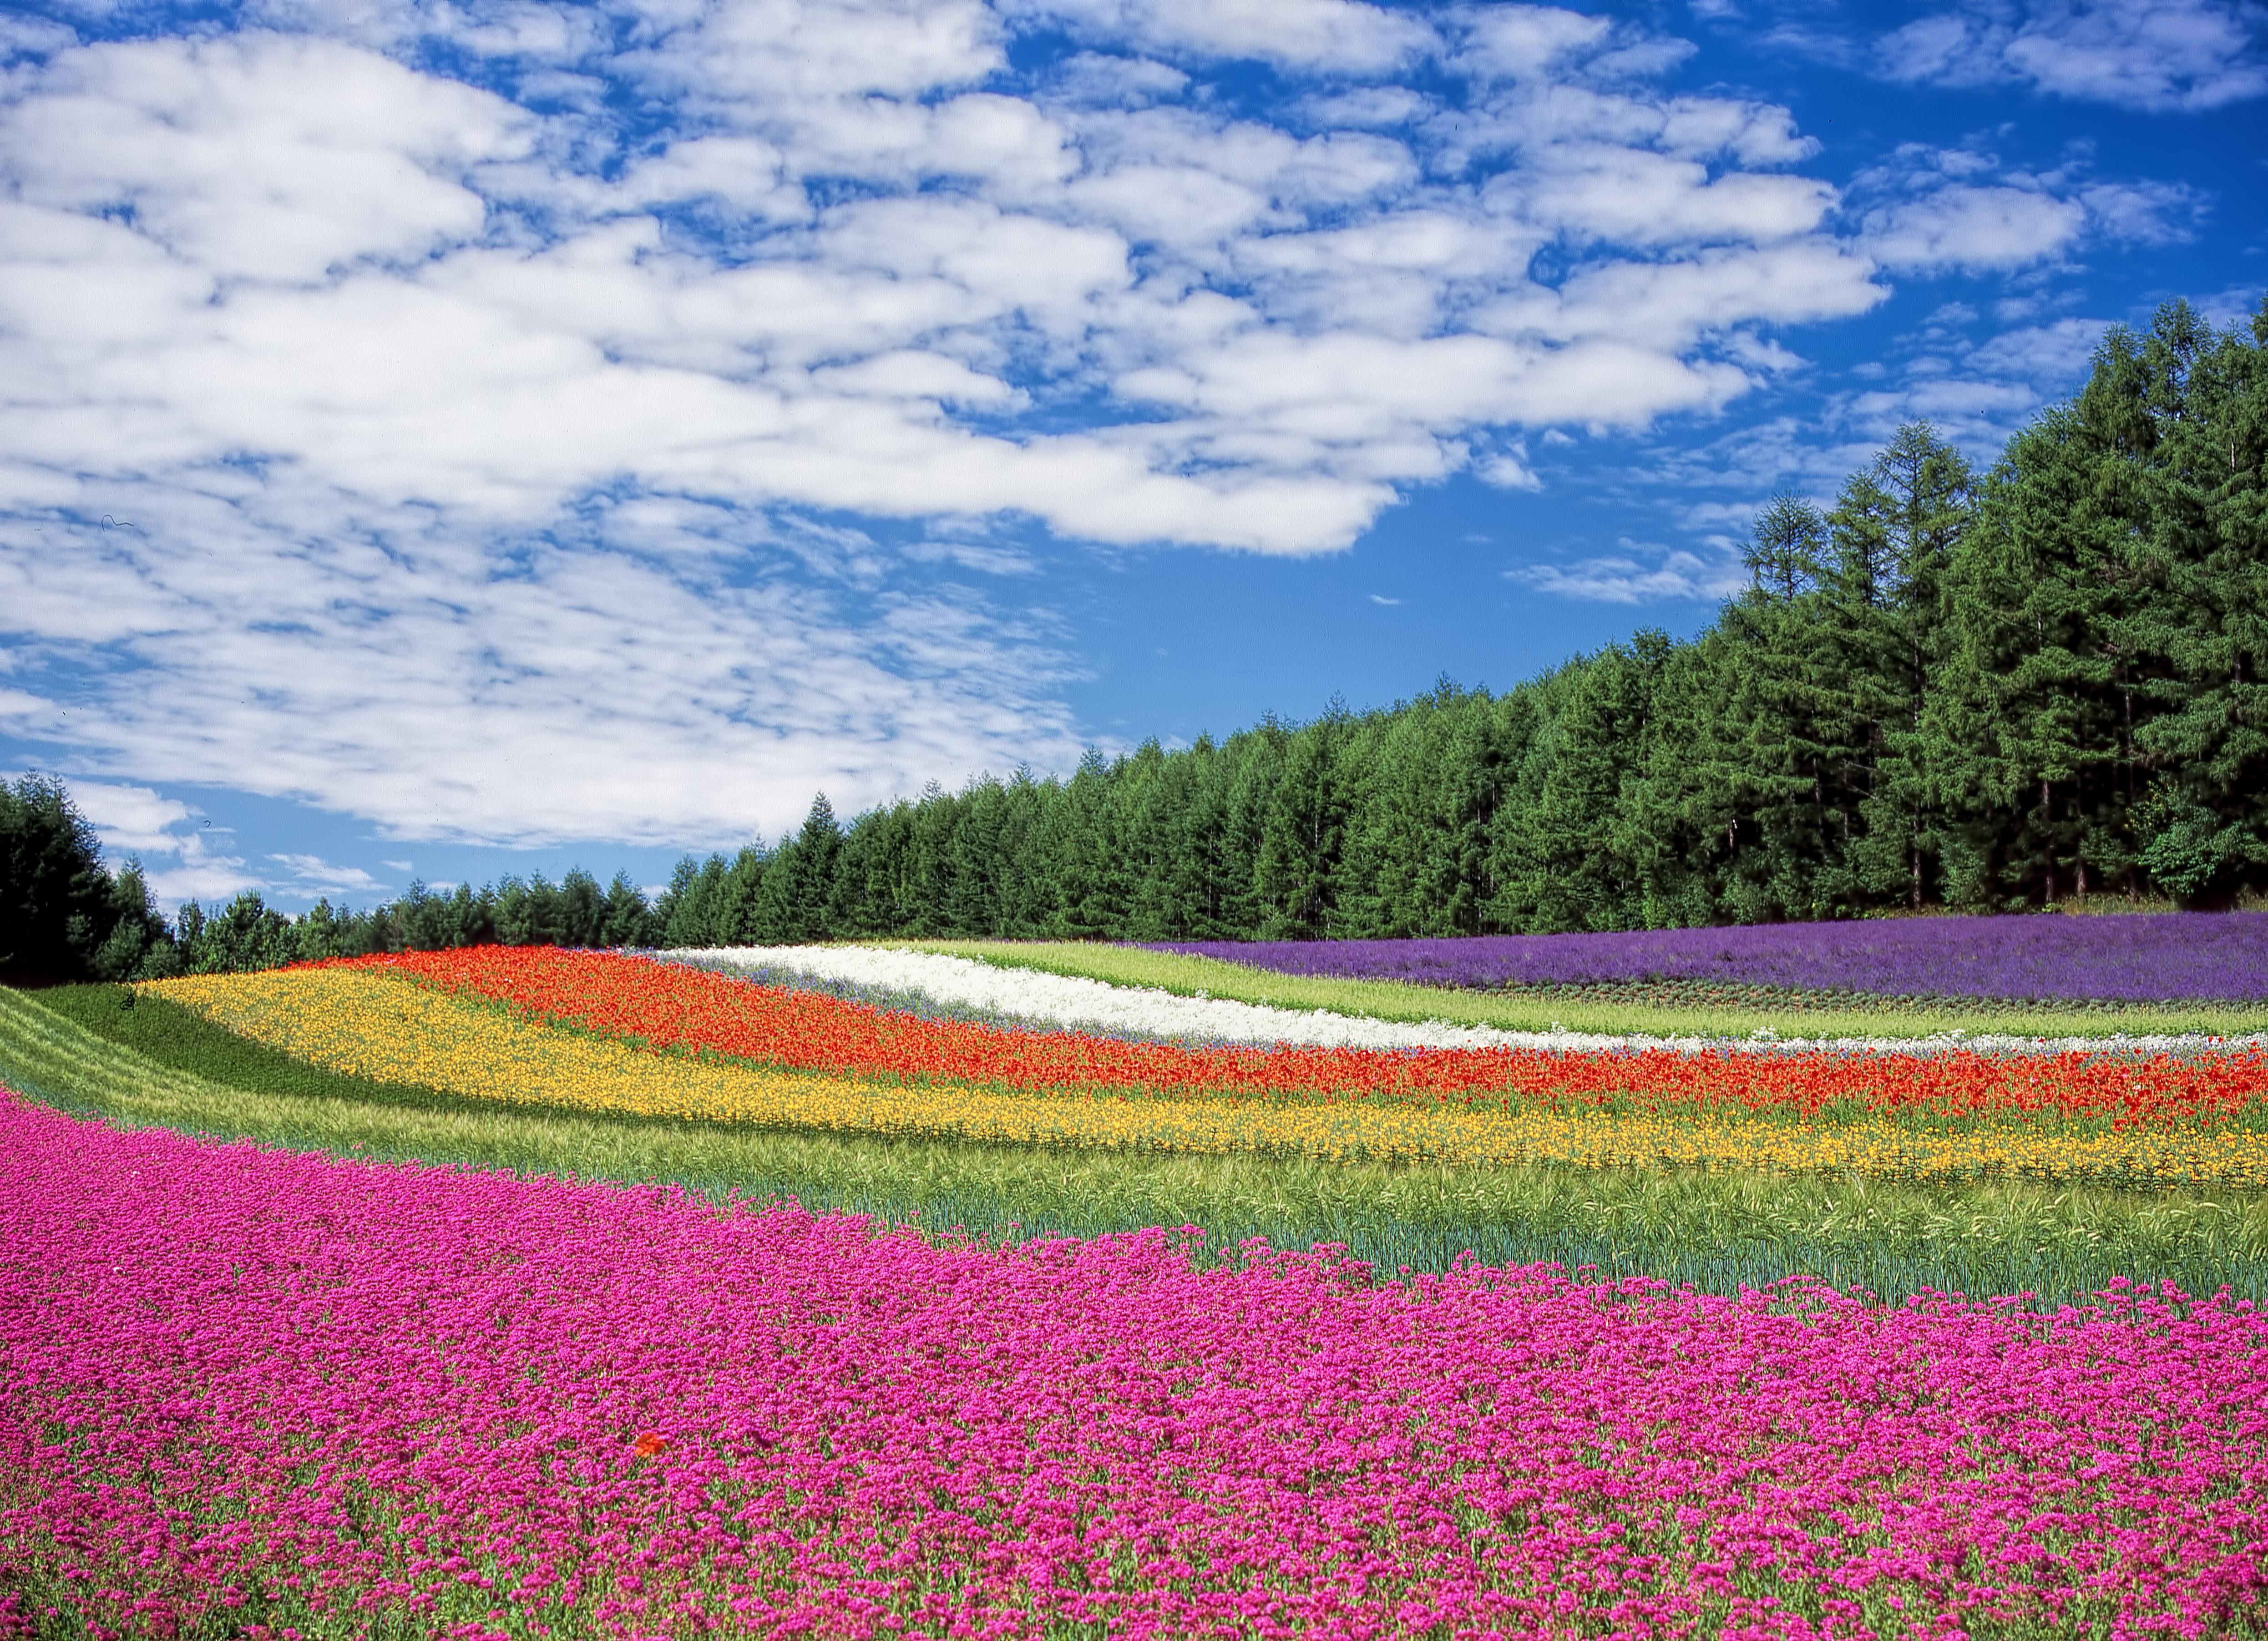 flower-garden-blue-sky-hokkaido-japan-60628.jpeg (4984×3607)